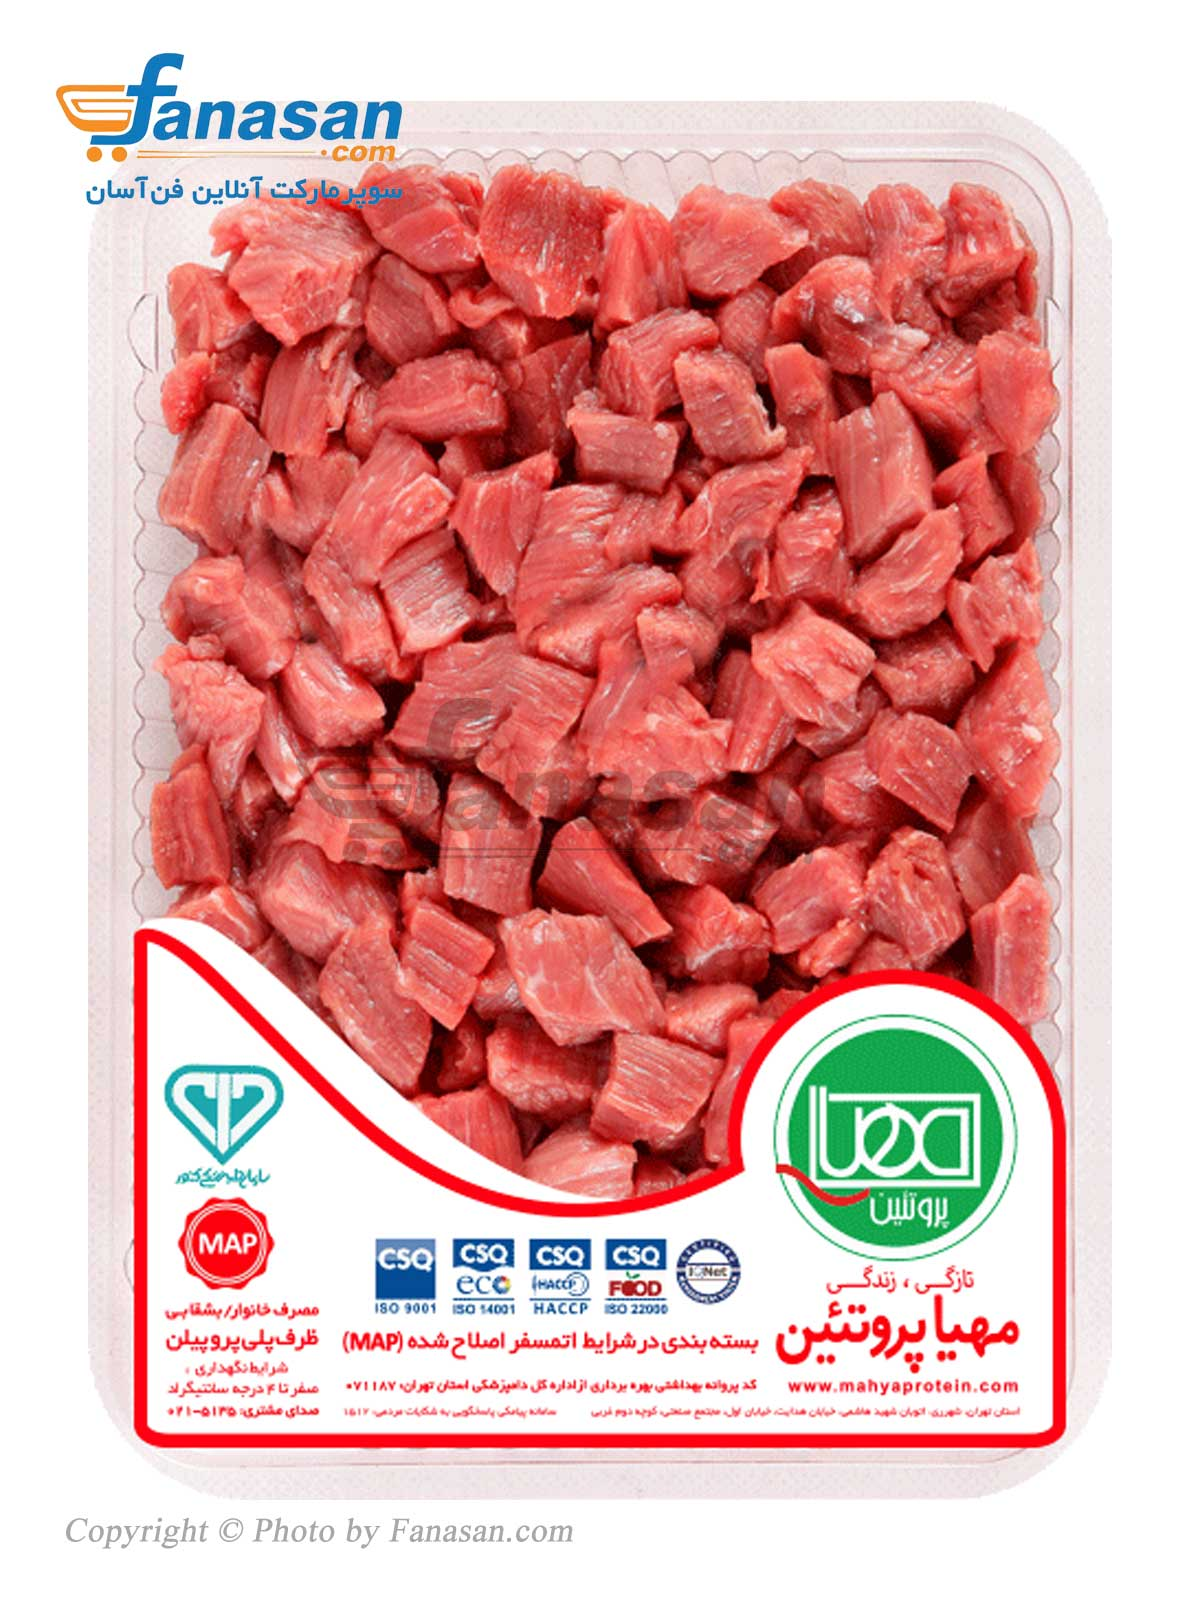 نگینی استانبولی گوساله مهیا پروتئین 500 گرم